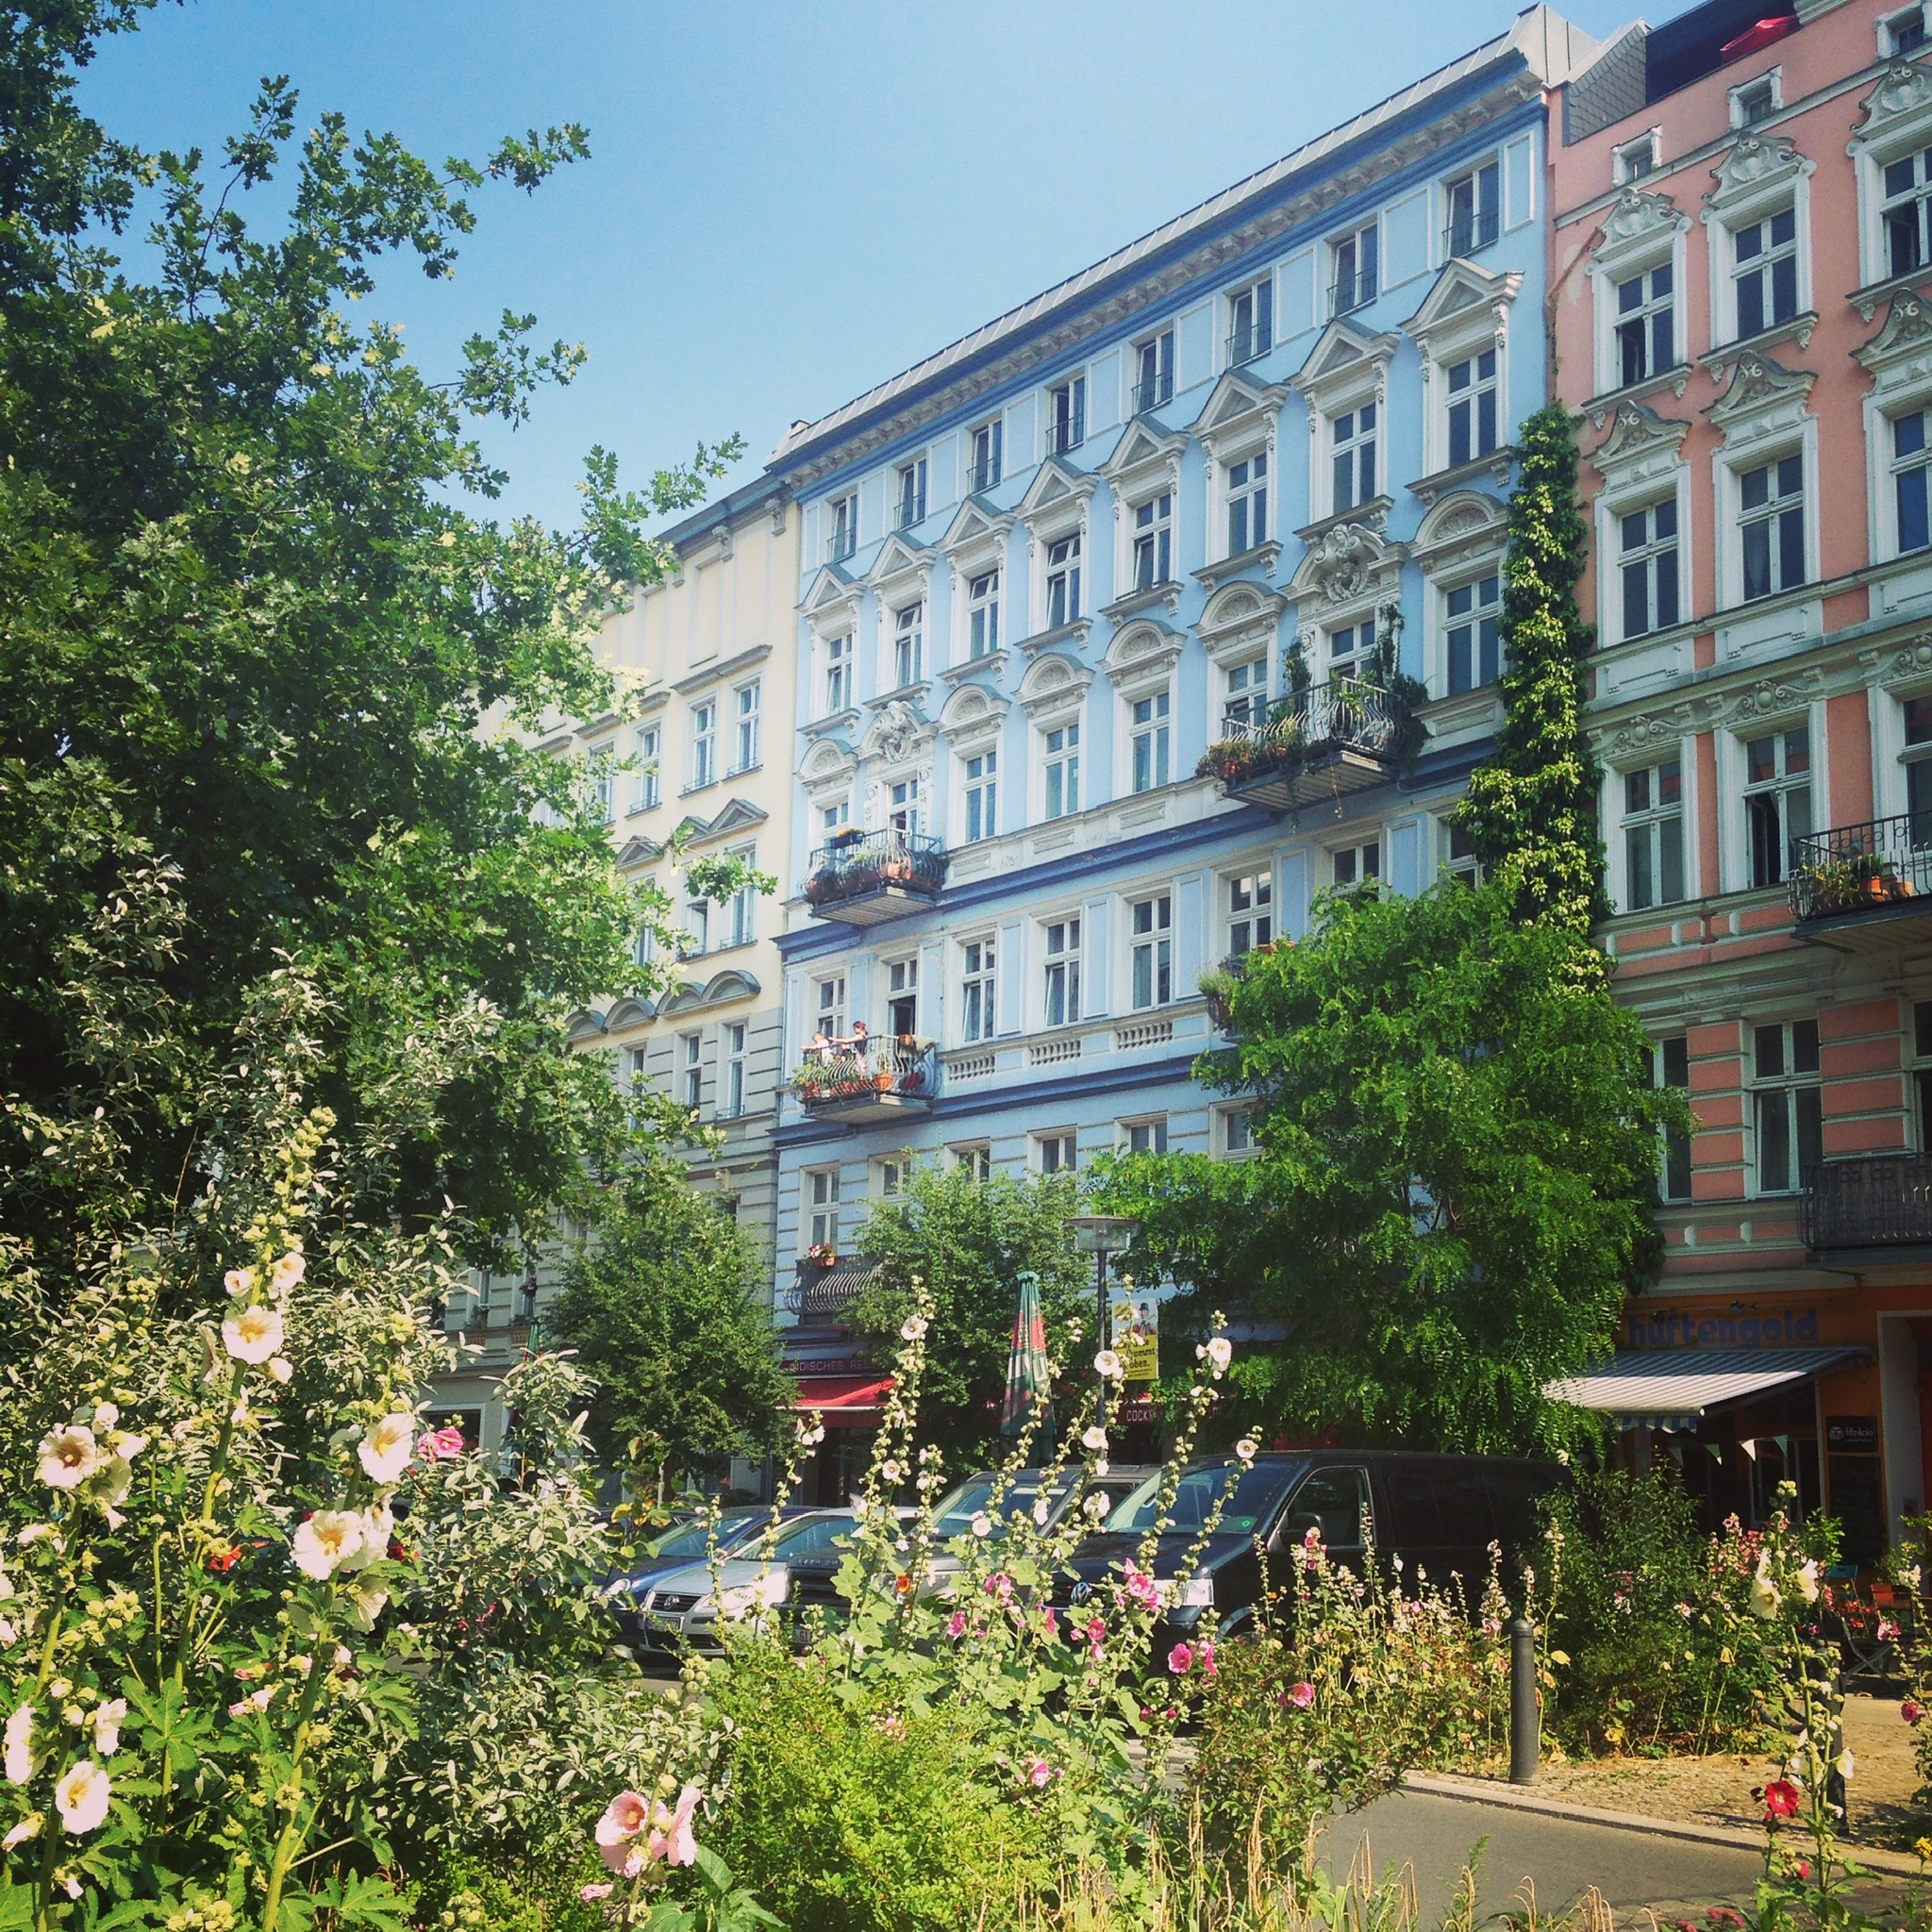 Prenzlauerberg, Berlin, Germany